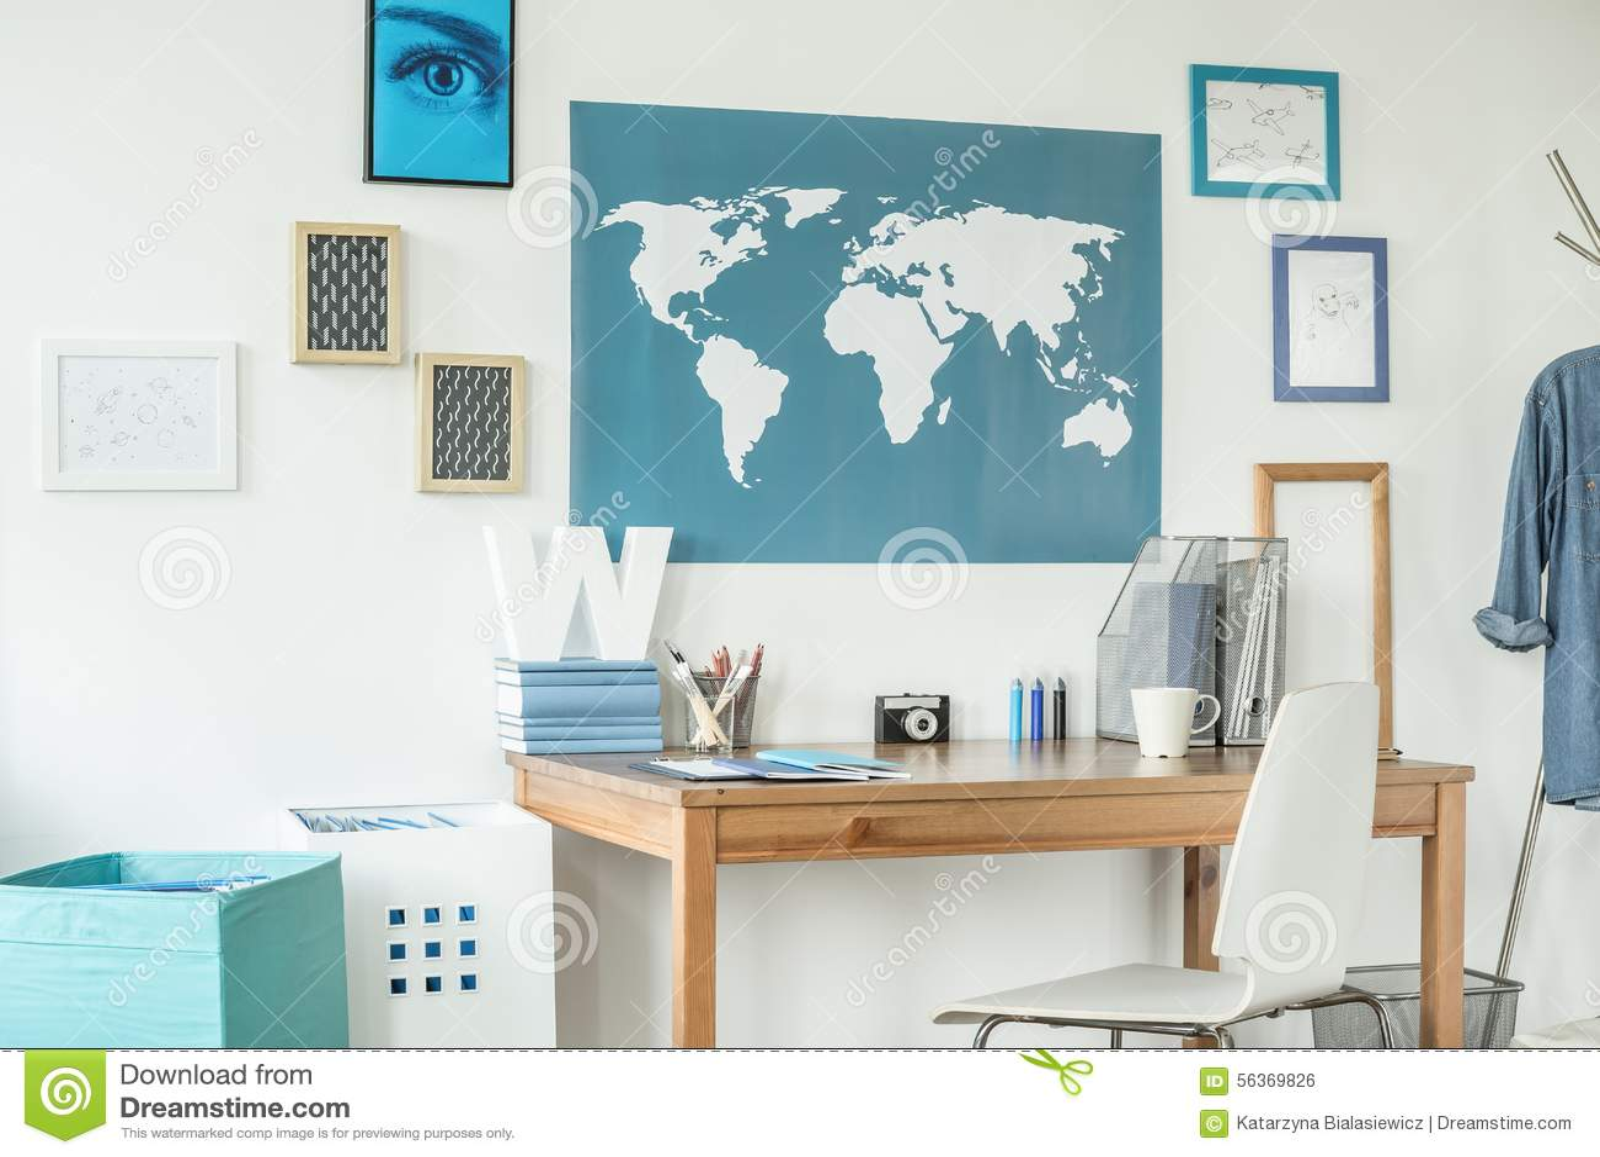 Home map teen dreams